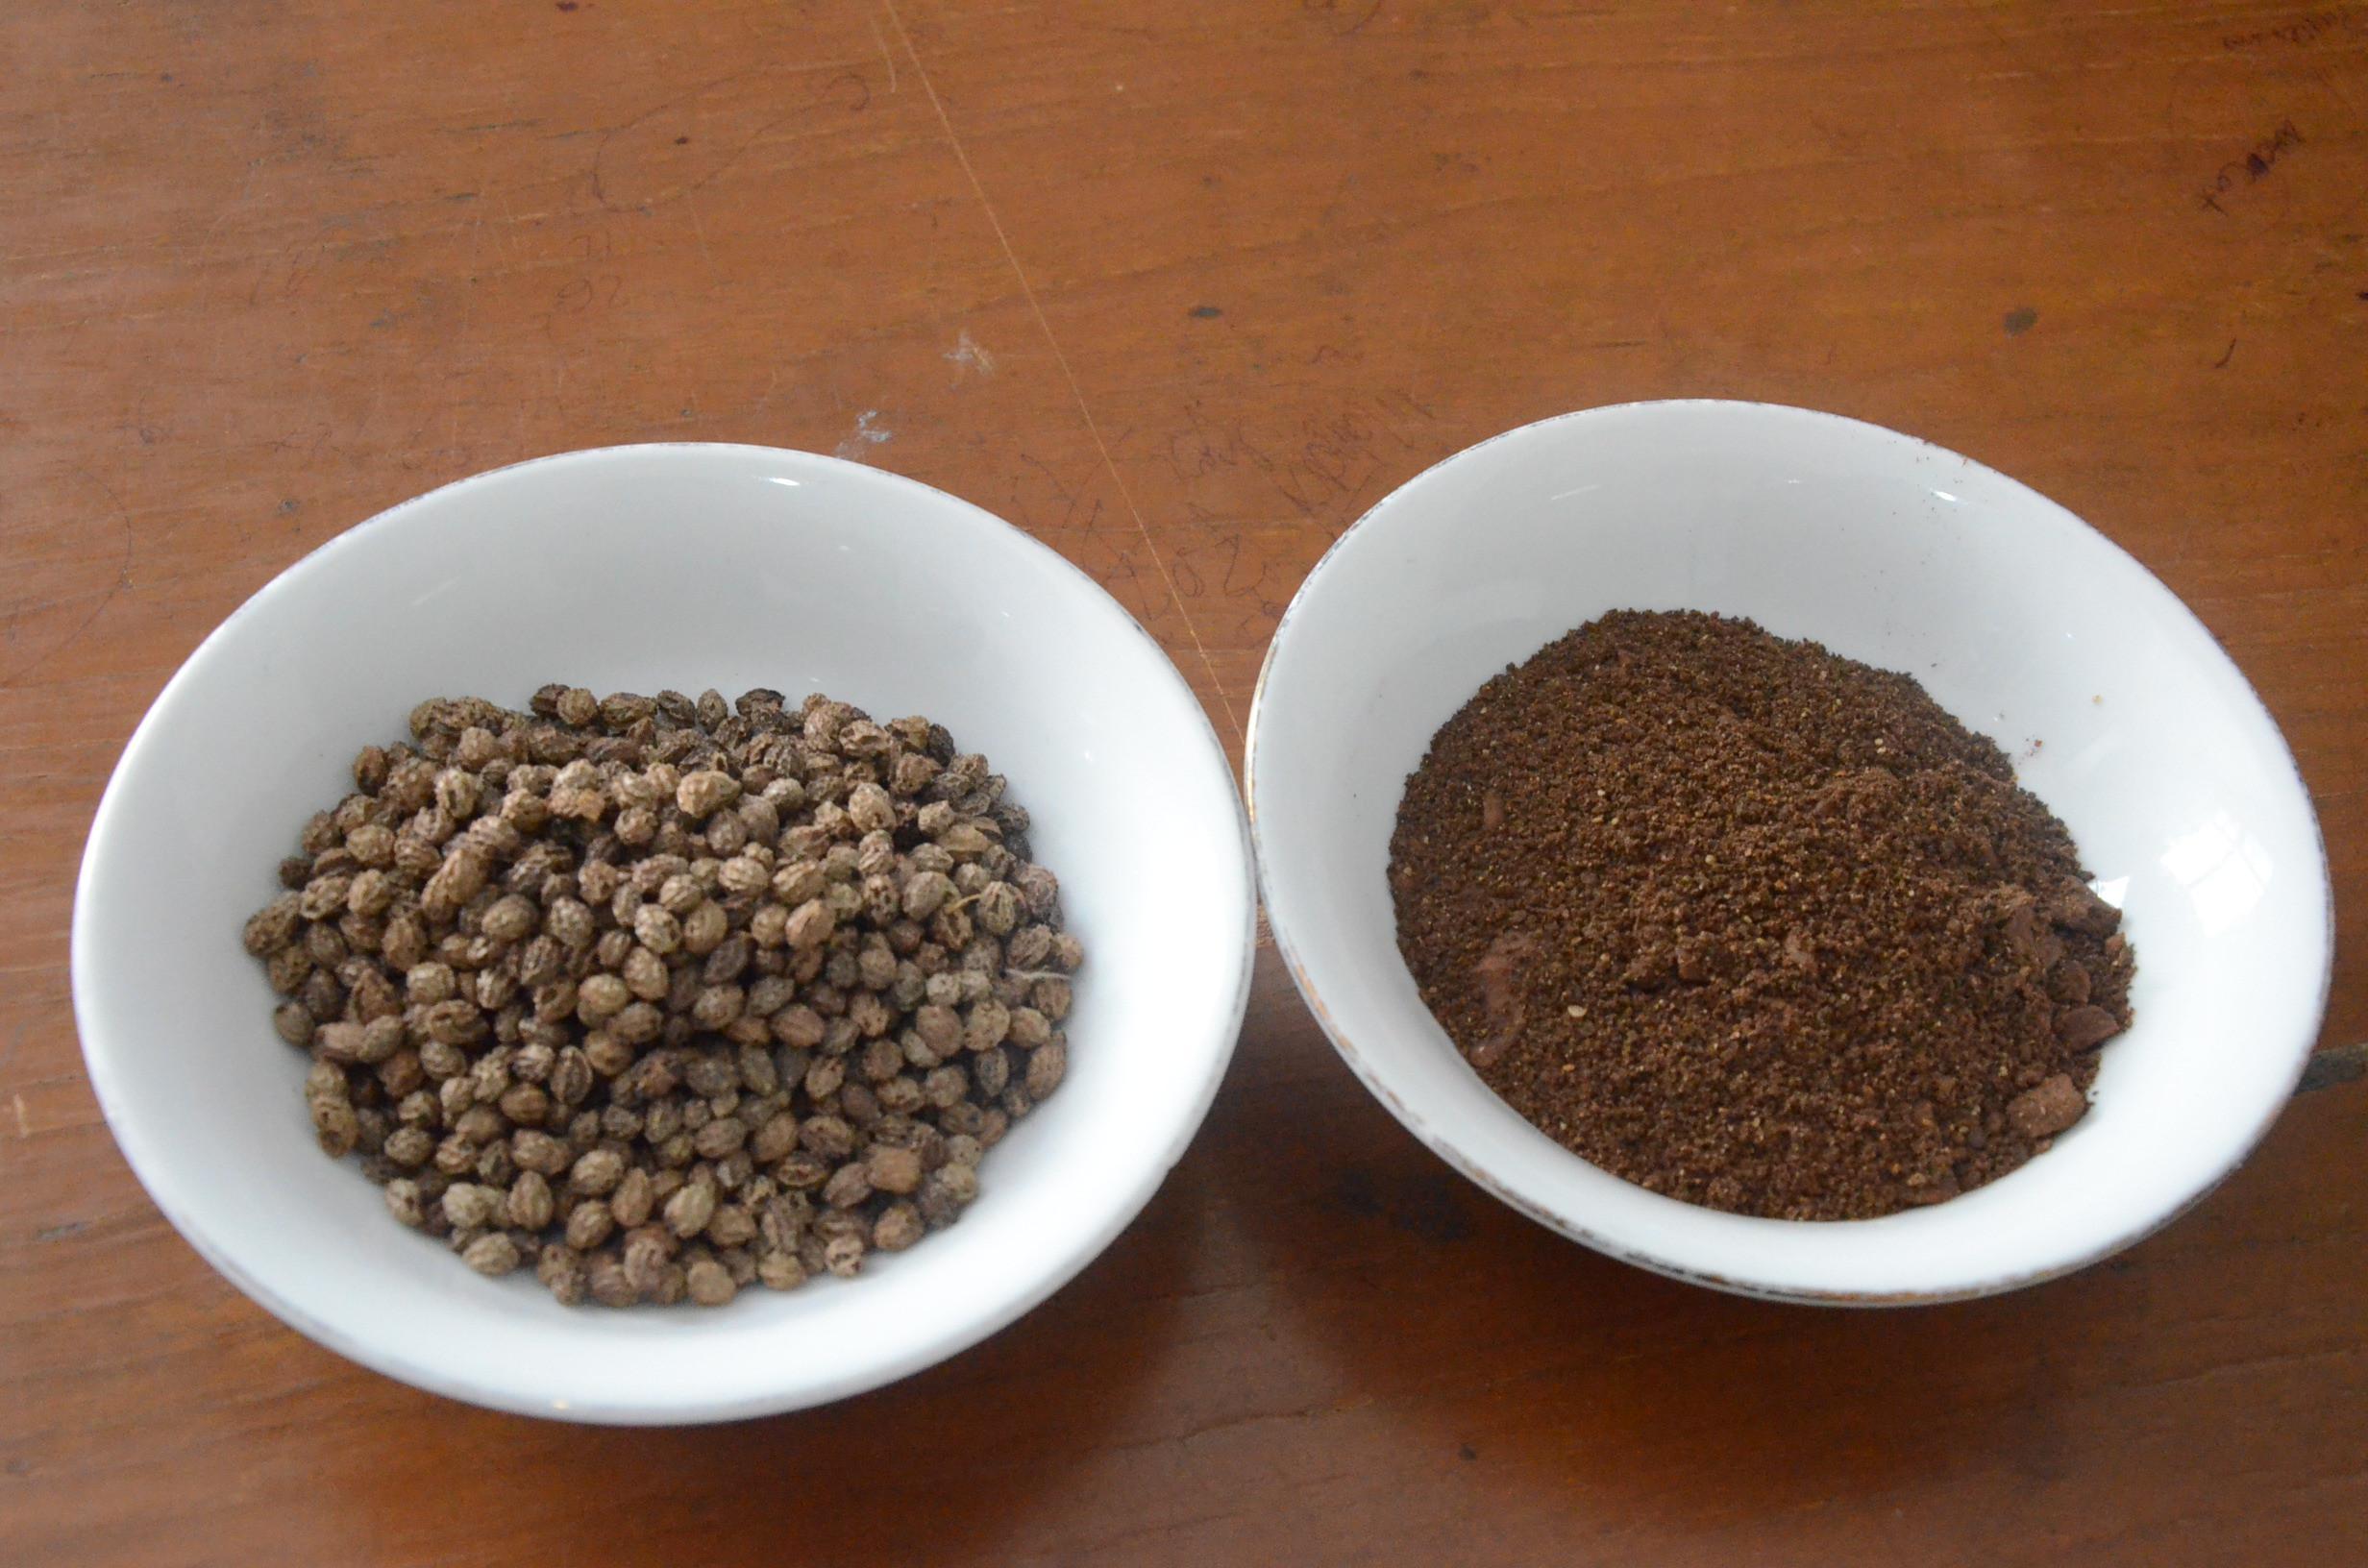 Biji pepaya yang sering dianggap limbah justru disulap oleh sejumlah mahasiswa menjadi kopi bebas kafein. (Liputan6.com/Switzy Sabandar).